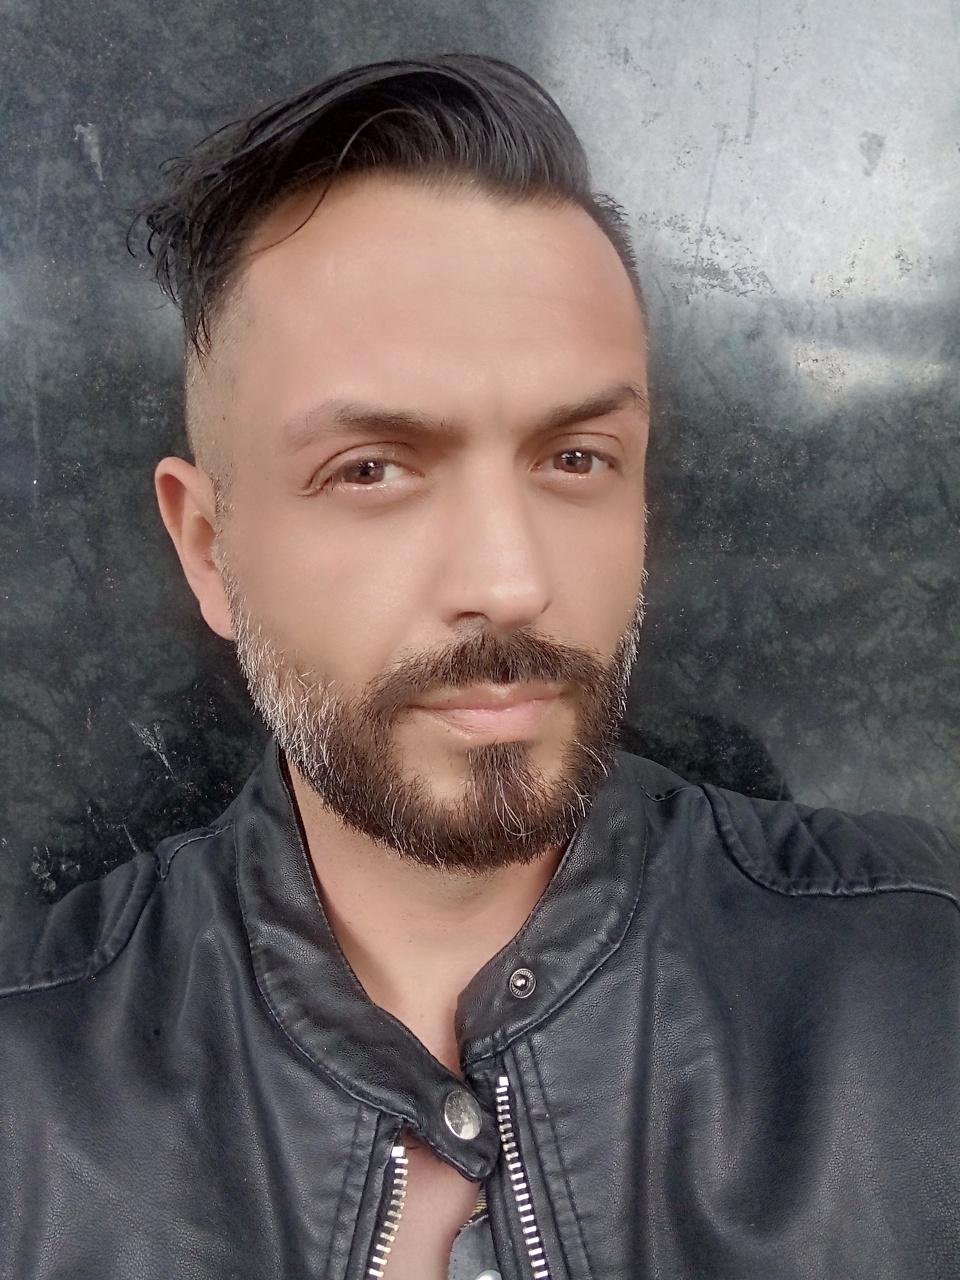 Mister-Deutschland-2021-Cuma-Portakal